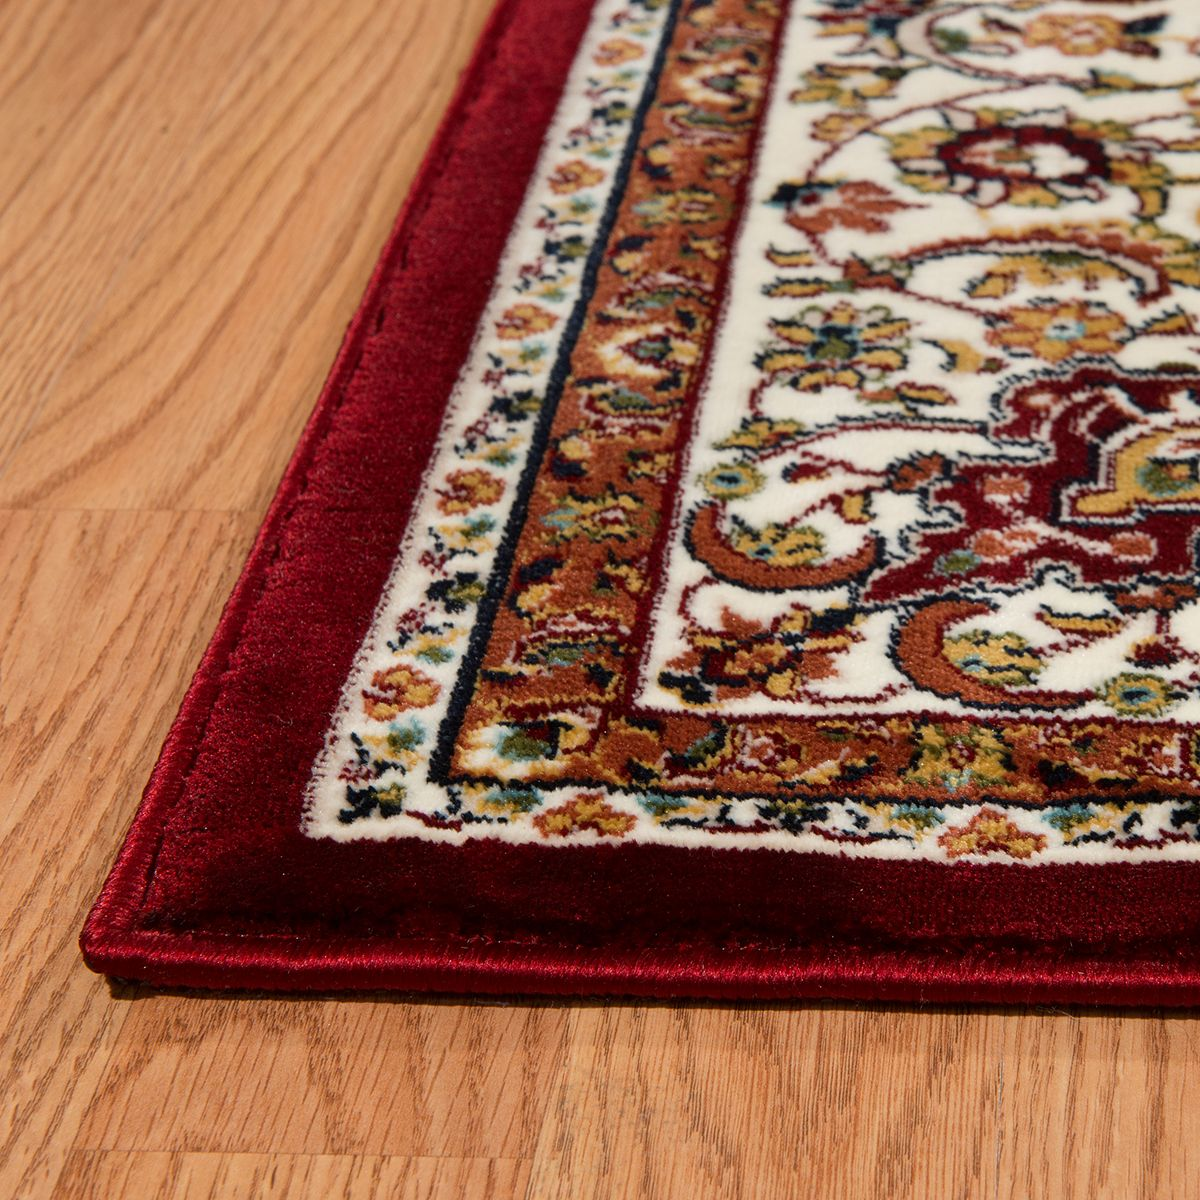 United Weavers Antiquities Isphahan Framed Floral Rug Ivory icQTB